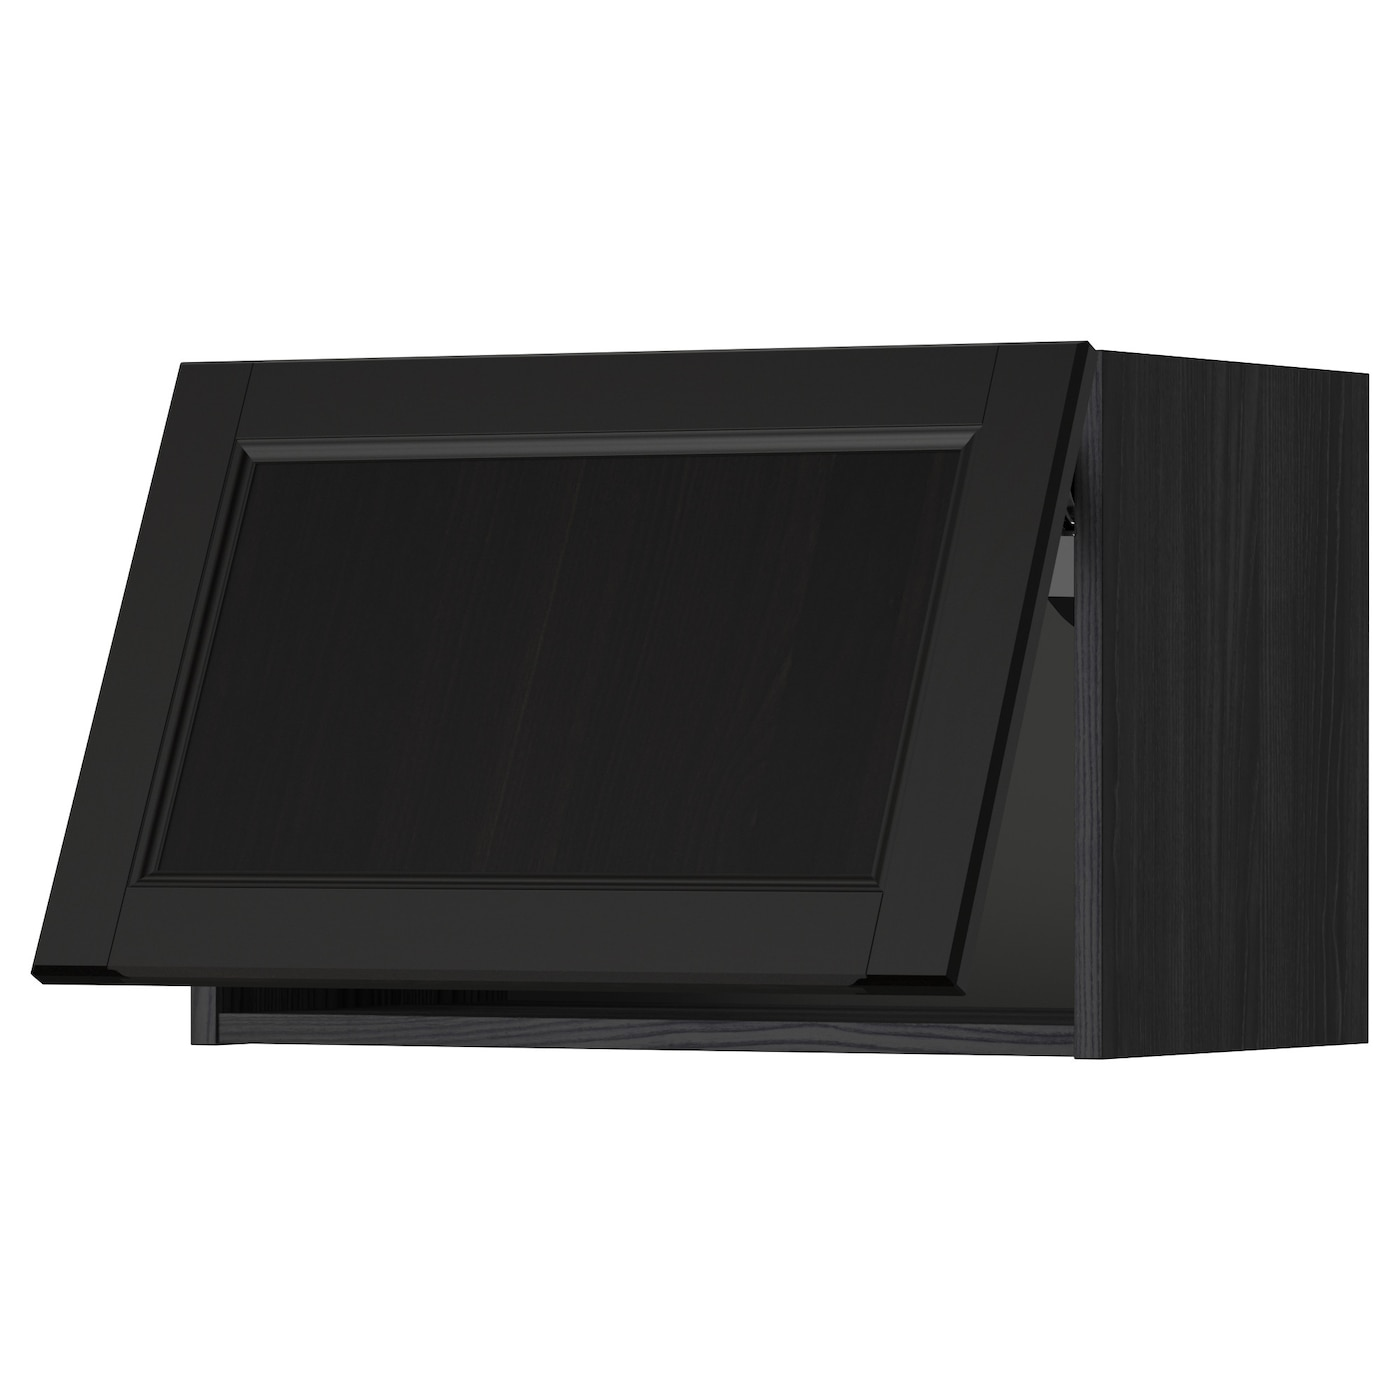 METOD Wall Cabinet Horizontal Black/laxarby Black-brown 60x40 Cm